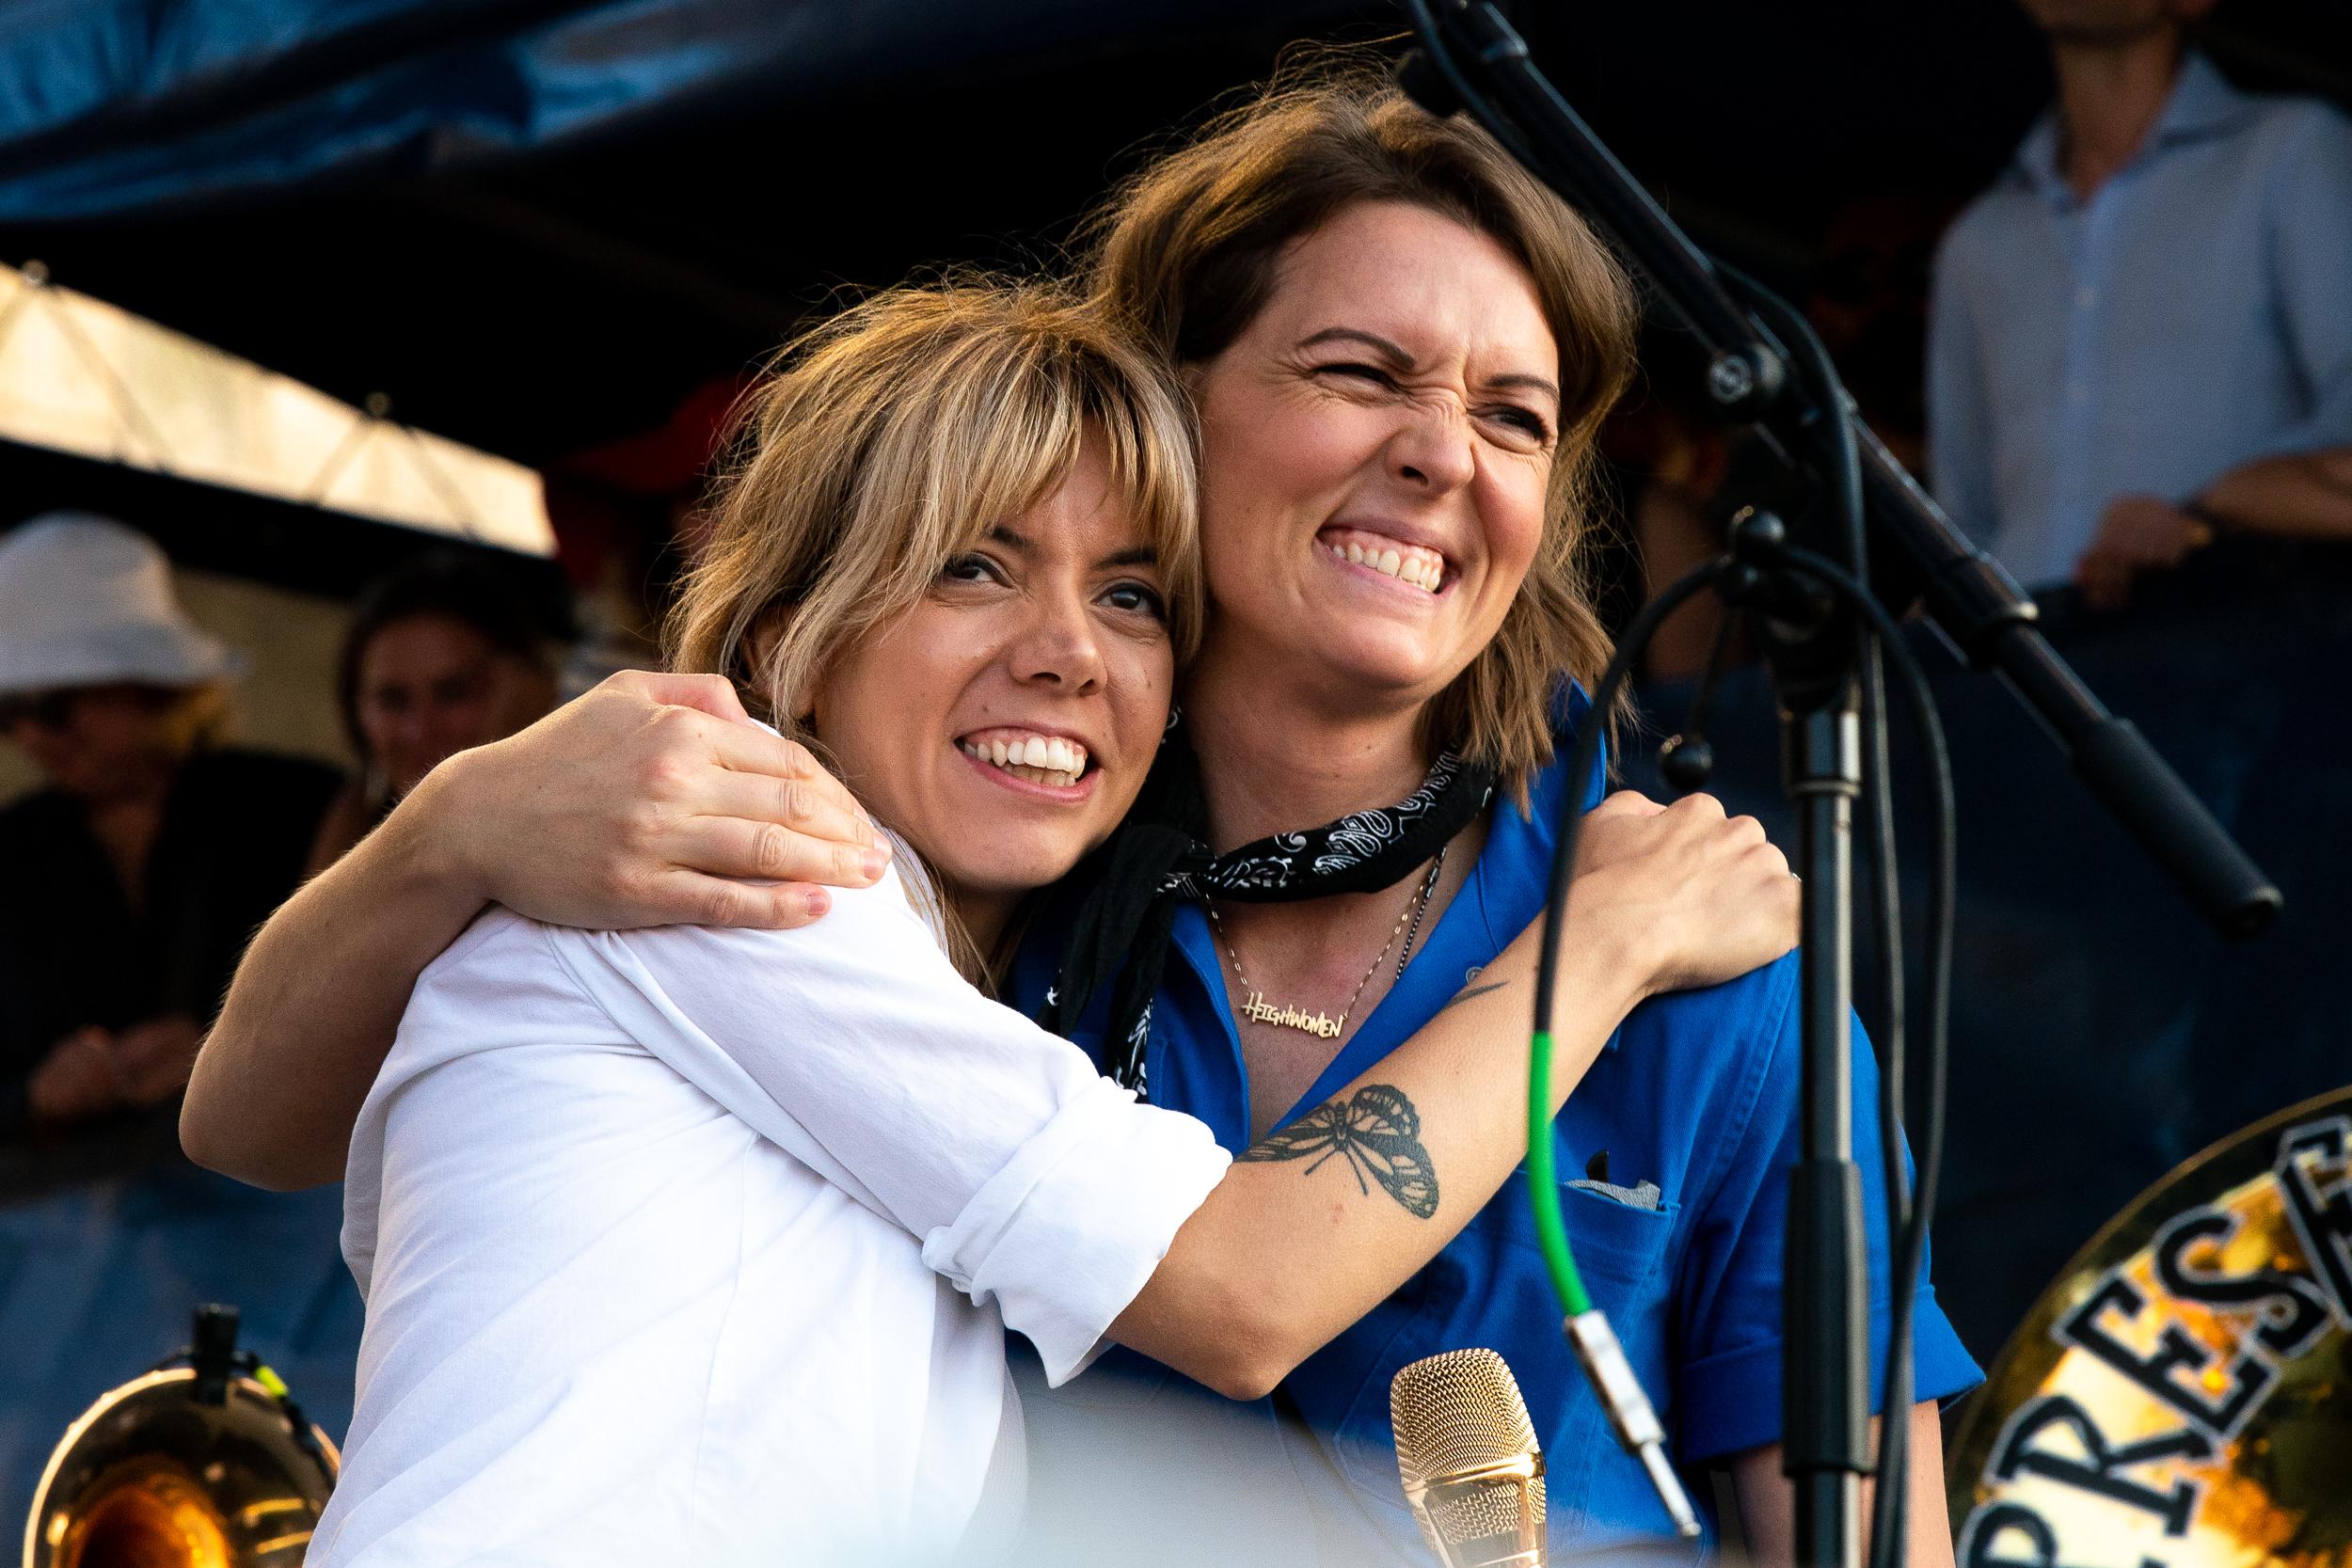 Alynda Segarra (Hurray for the Riff Raff) and Brandi Carlile at Newport Folk Festival (Photo by Mauricio Castro)